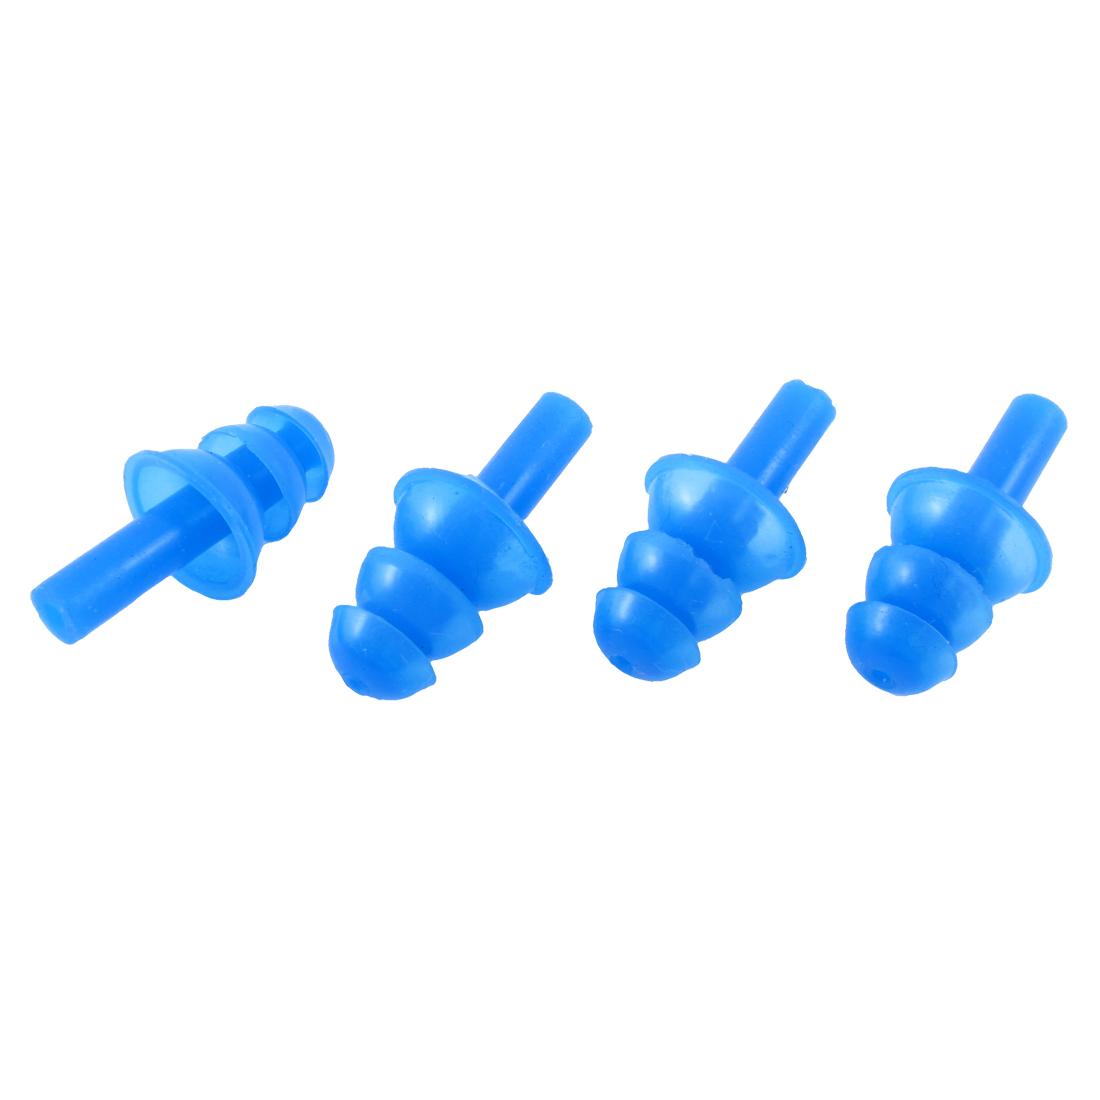 2 Pairs Blue Silicone Water Sports Swim Hearing Protection Earplugs Earplug